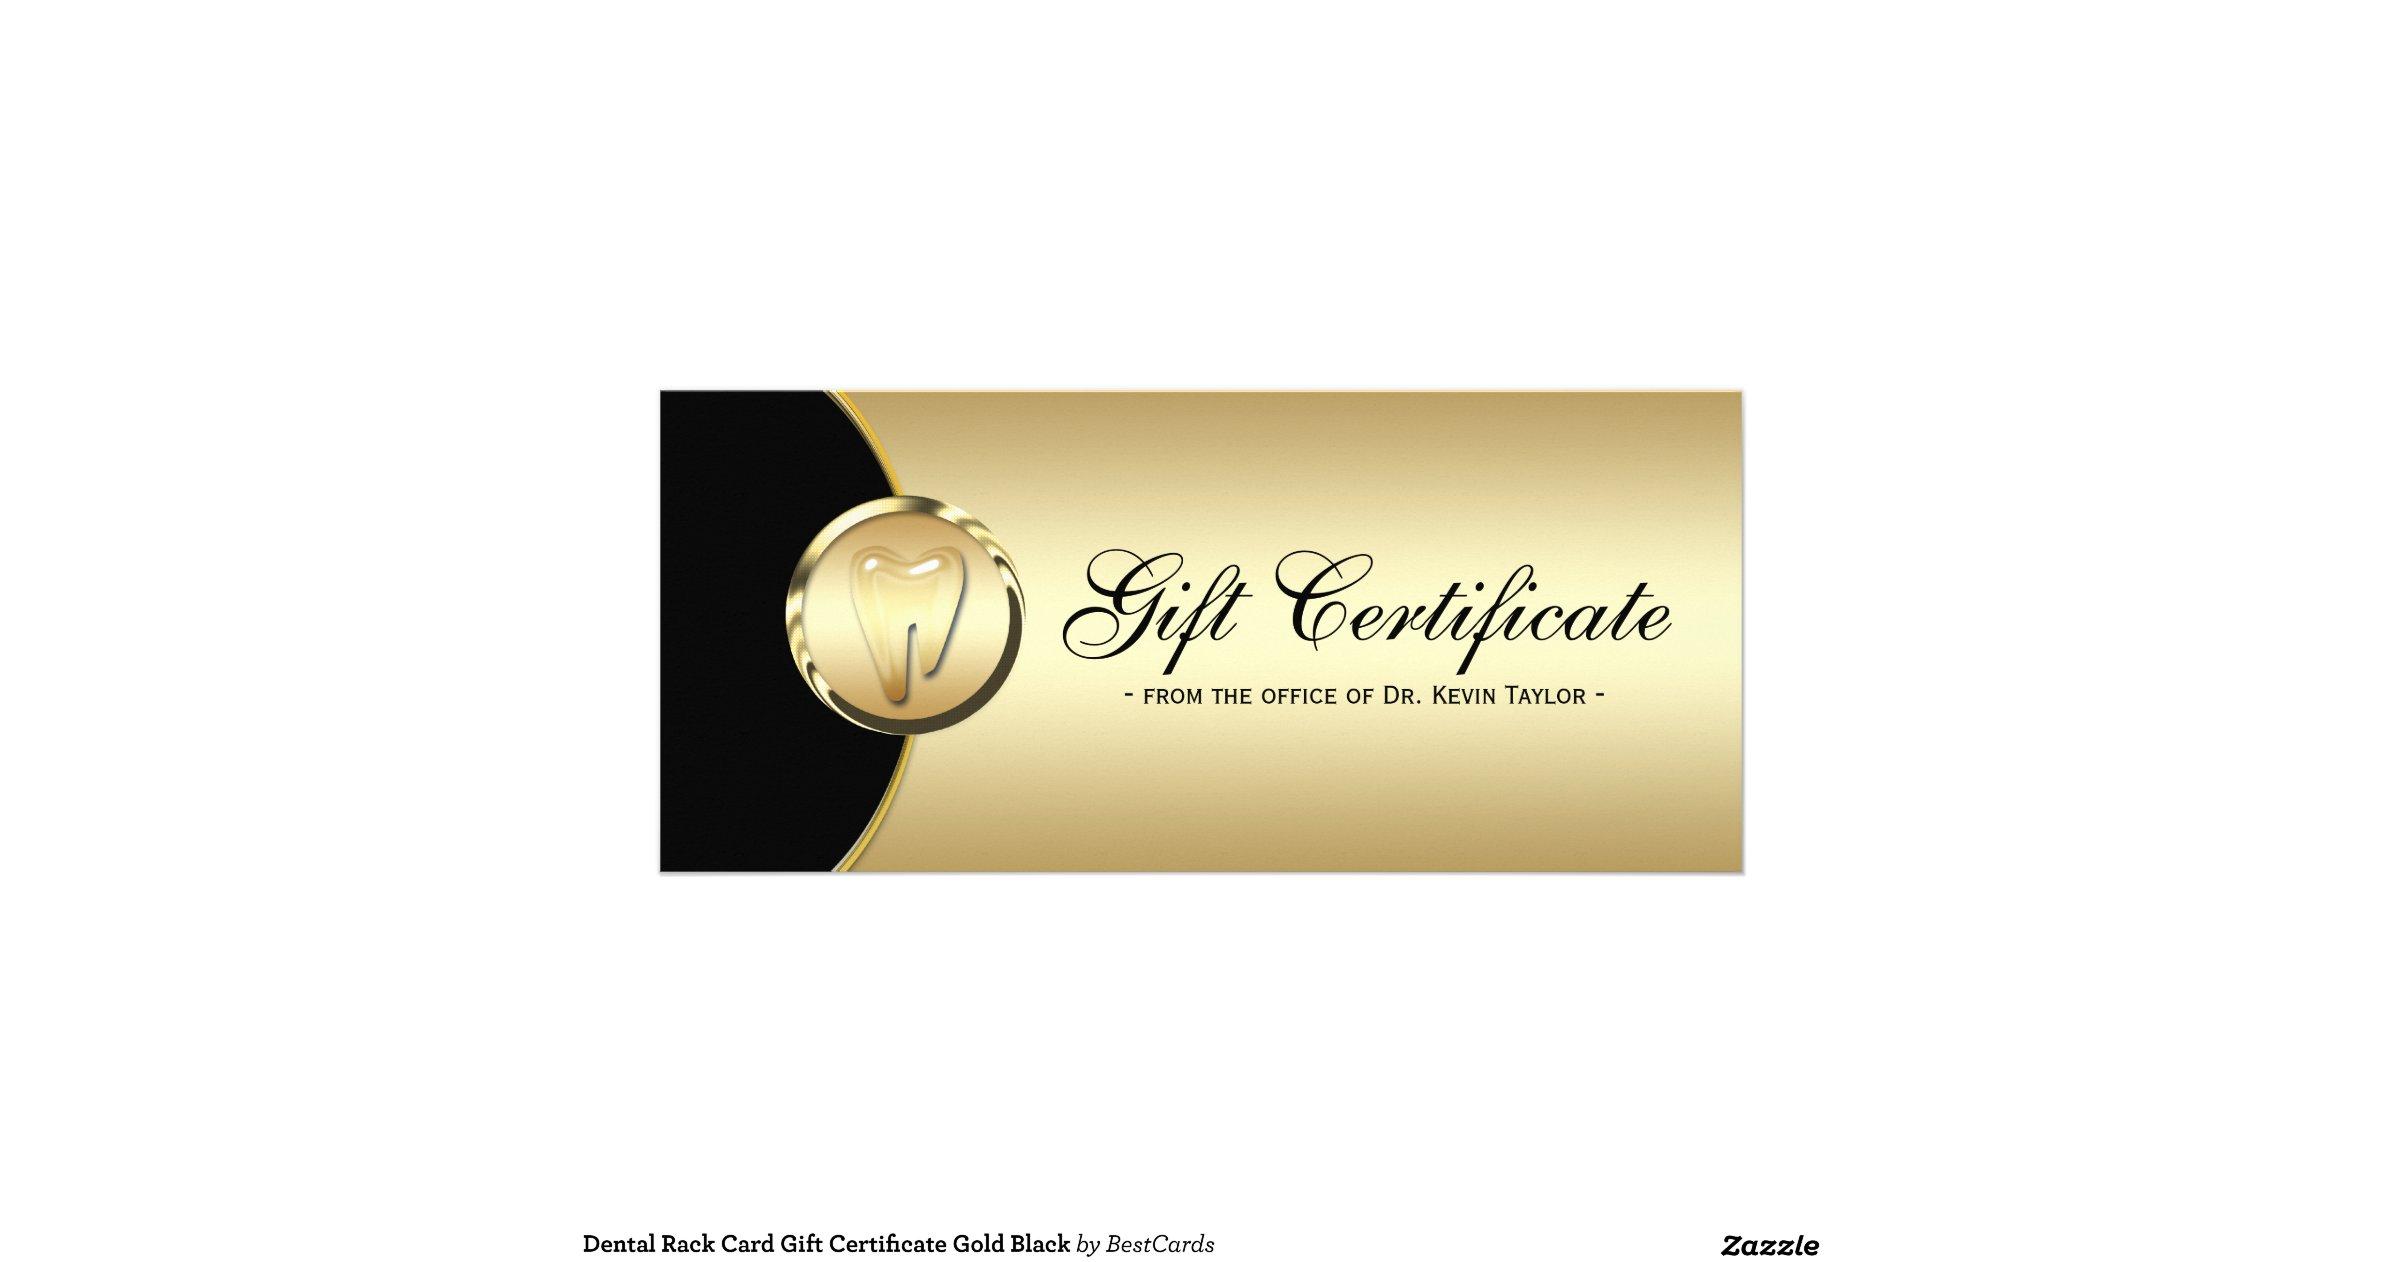 Dental rack card gift certificate gold black for Dental gift certificate template